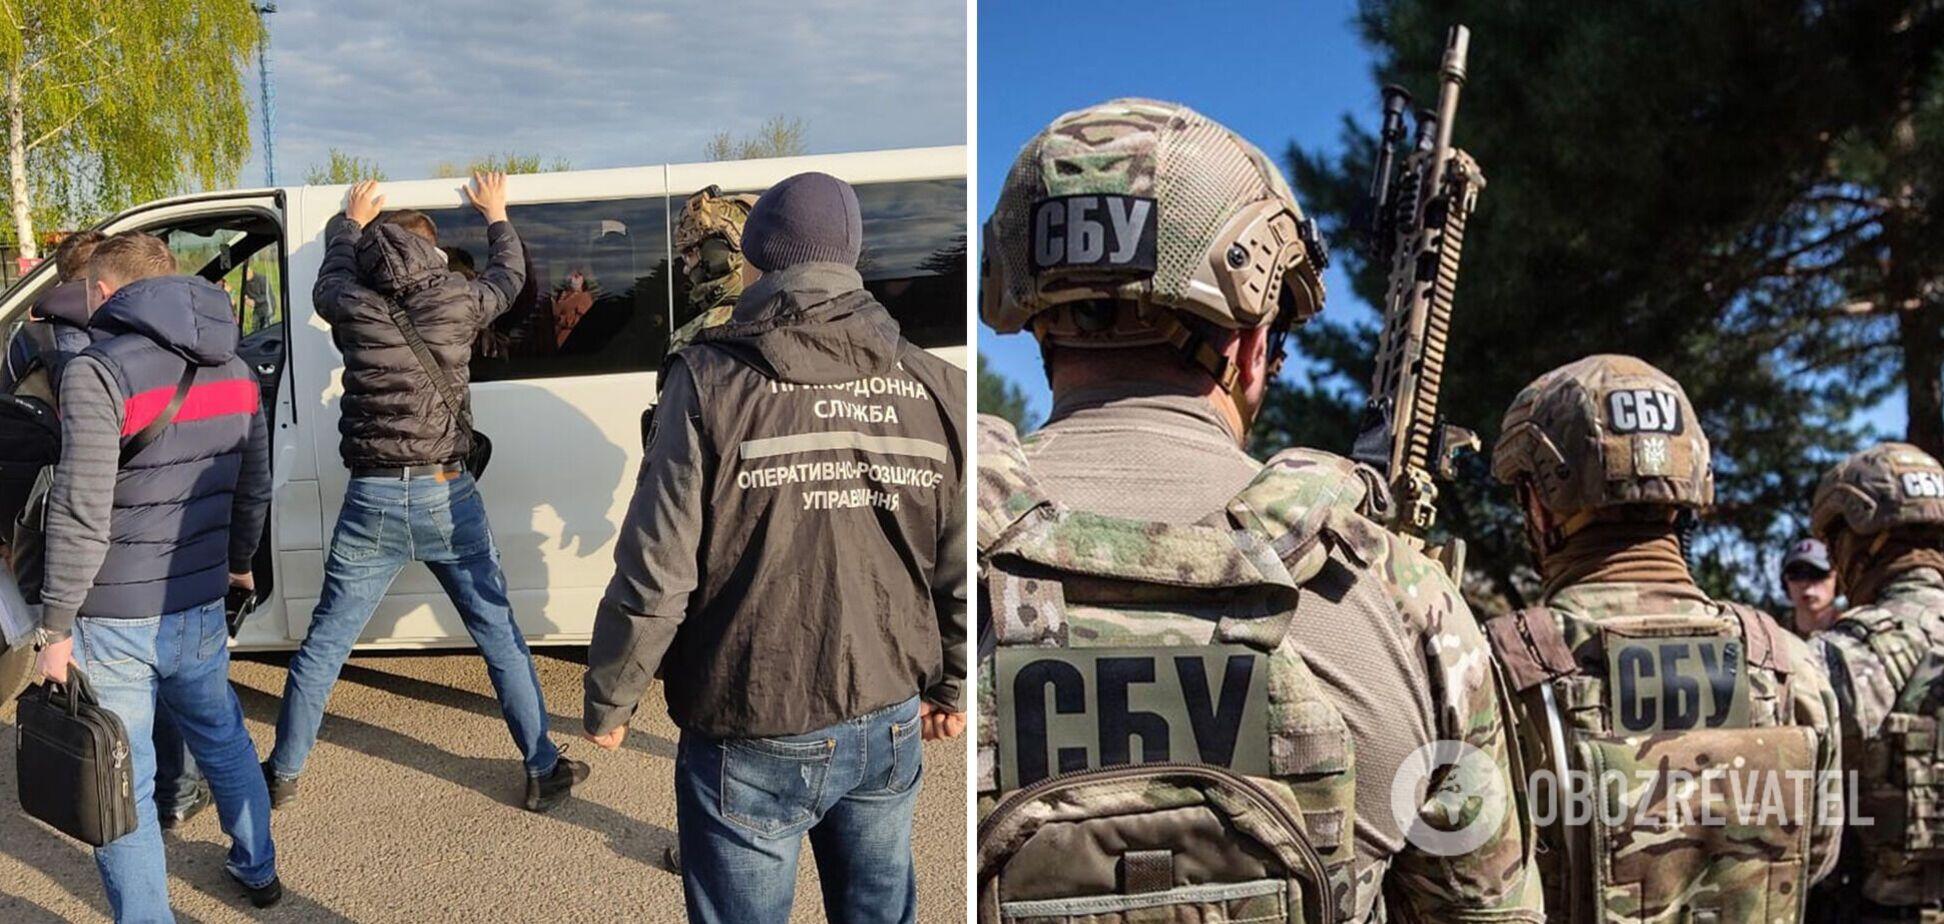 СБУ задержала нелегального перевозчика, который платил дань террористам 'ДНР'. Фото